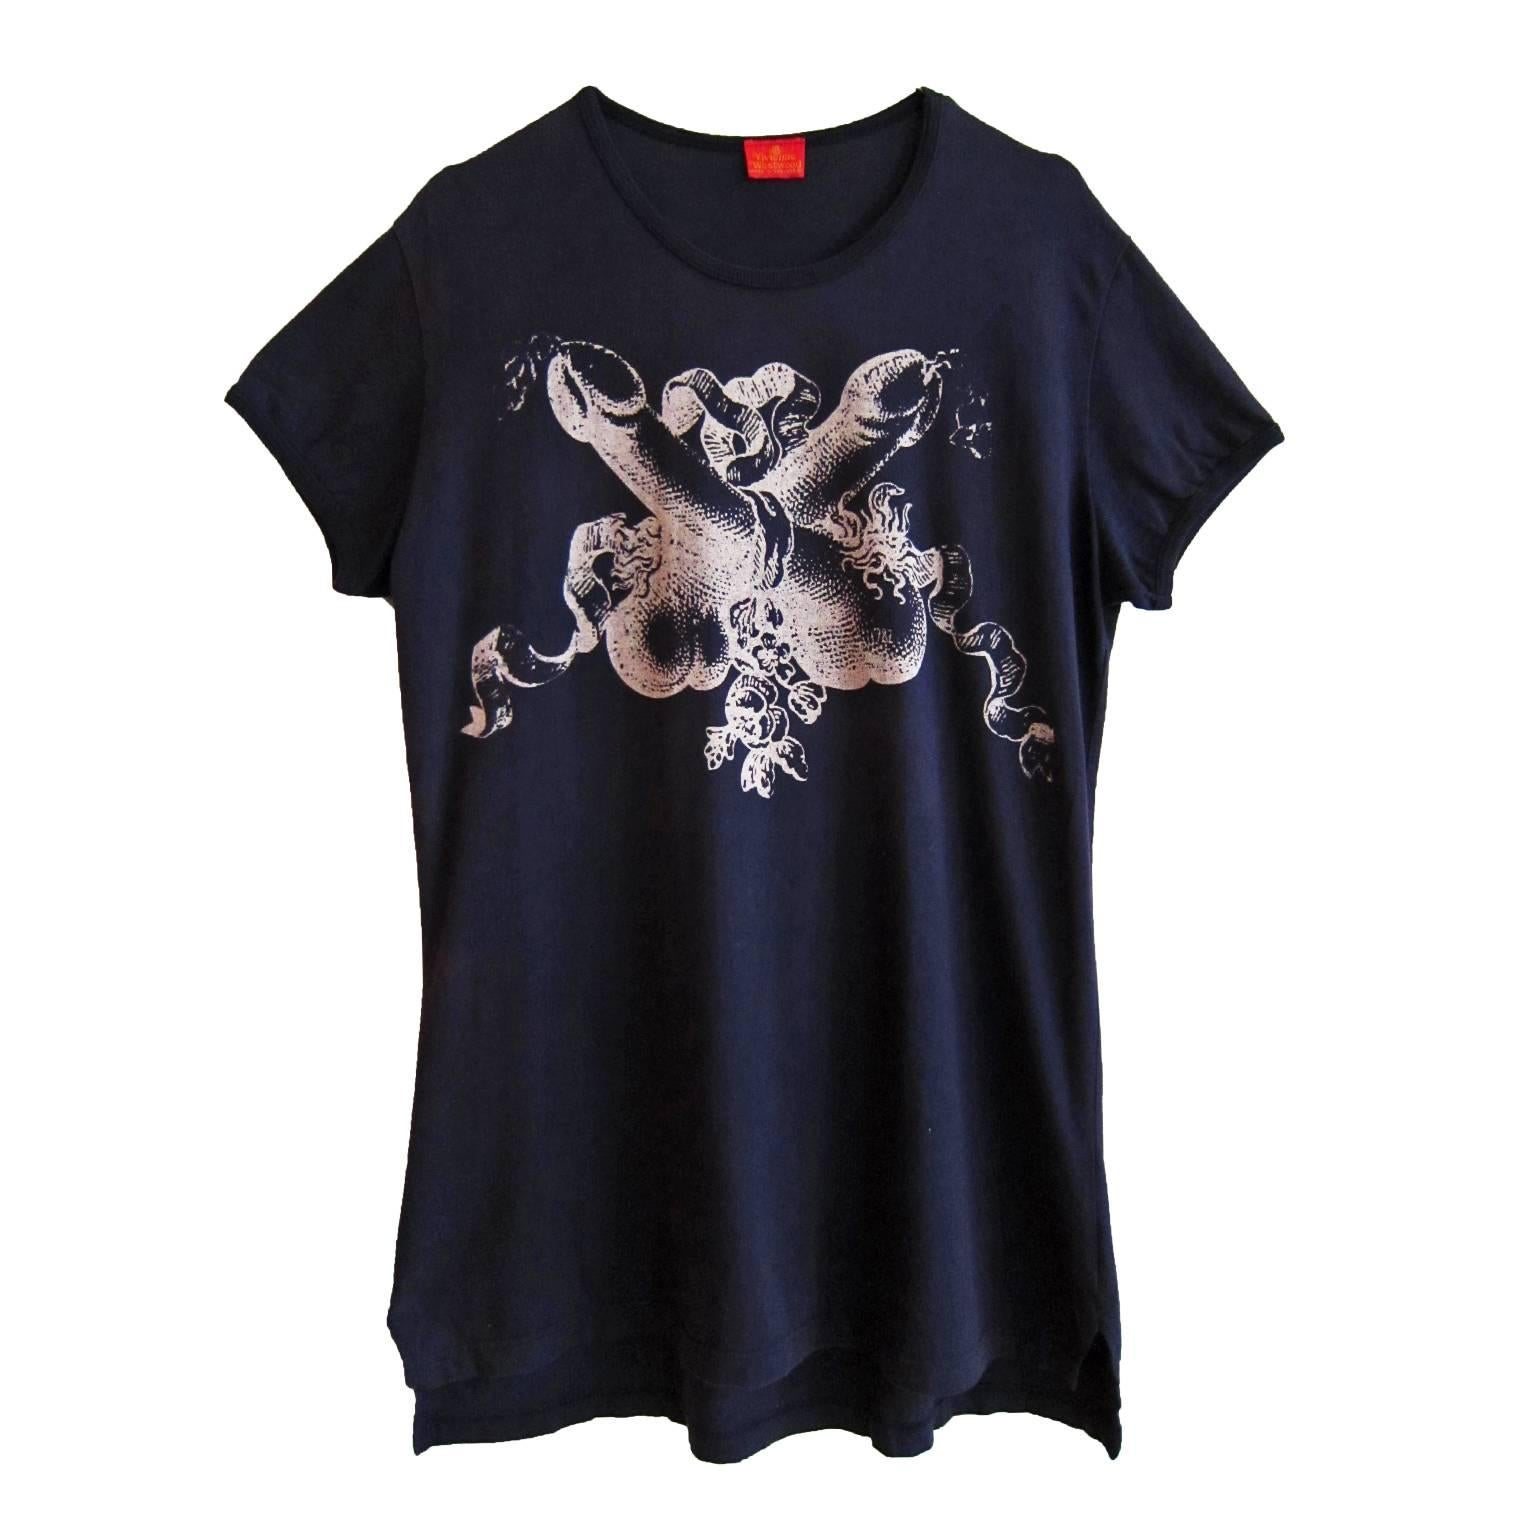 Vivienne Westwood Two Crossed Penises T shirt 90's